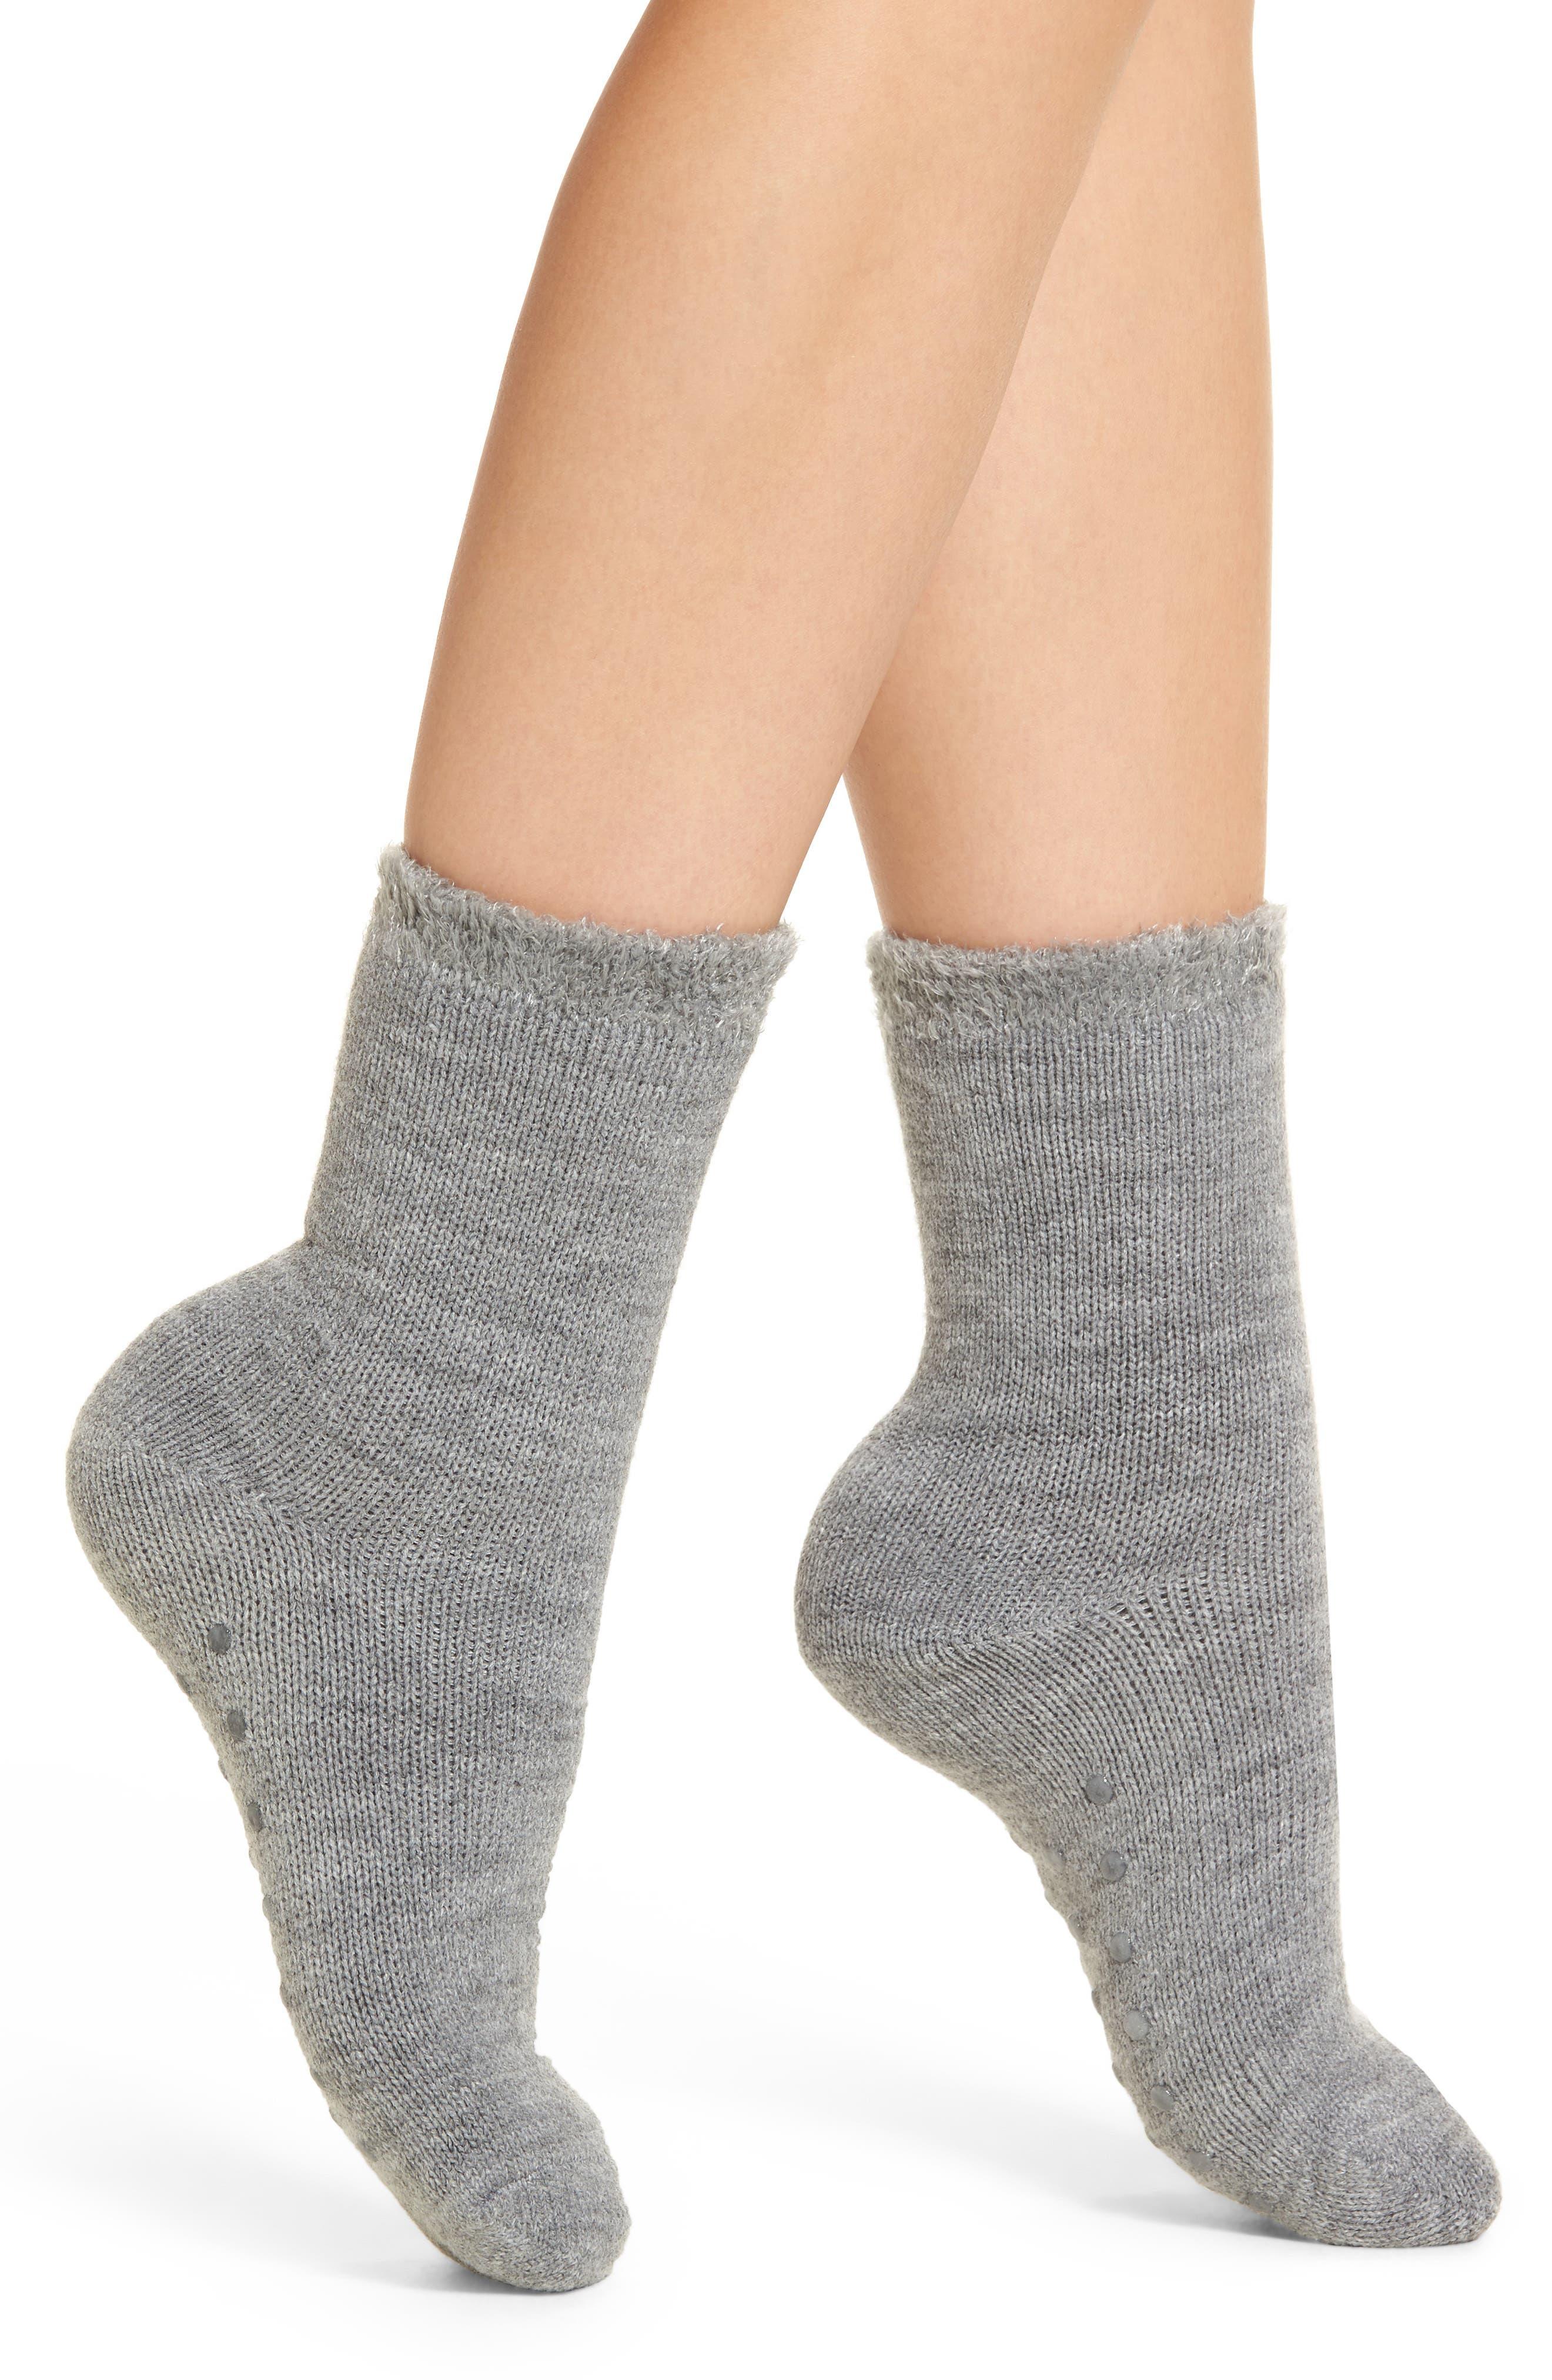 Butter Cuff Socks,                             Main thumbnail 2, color,